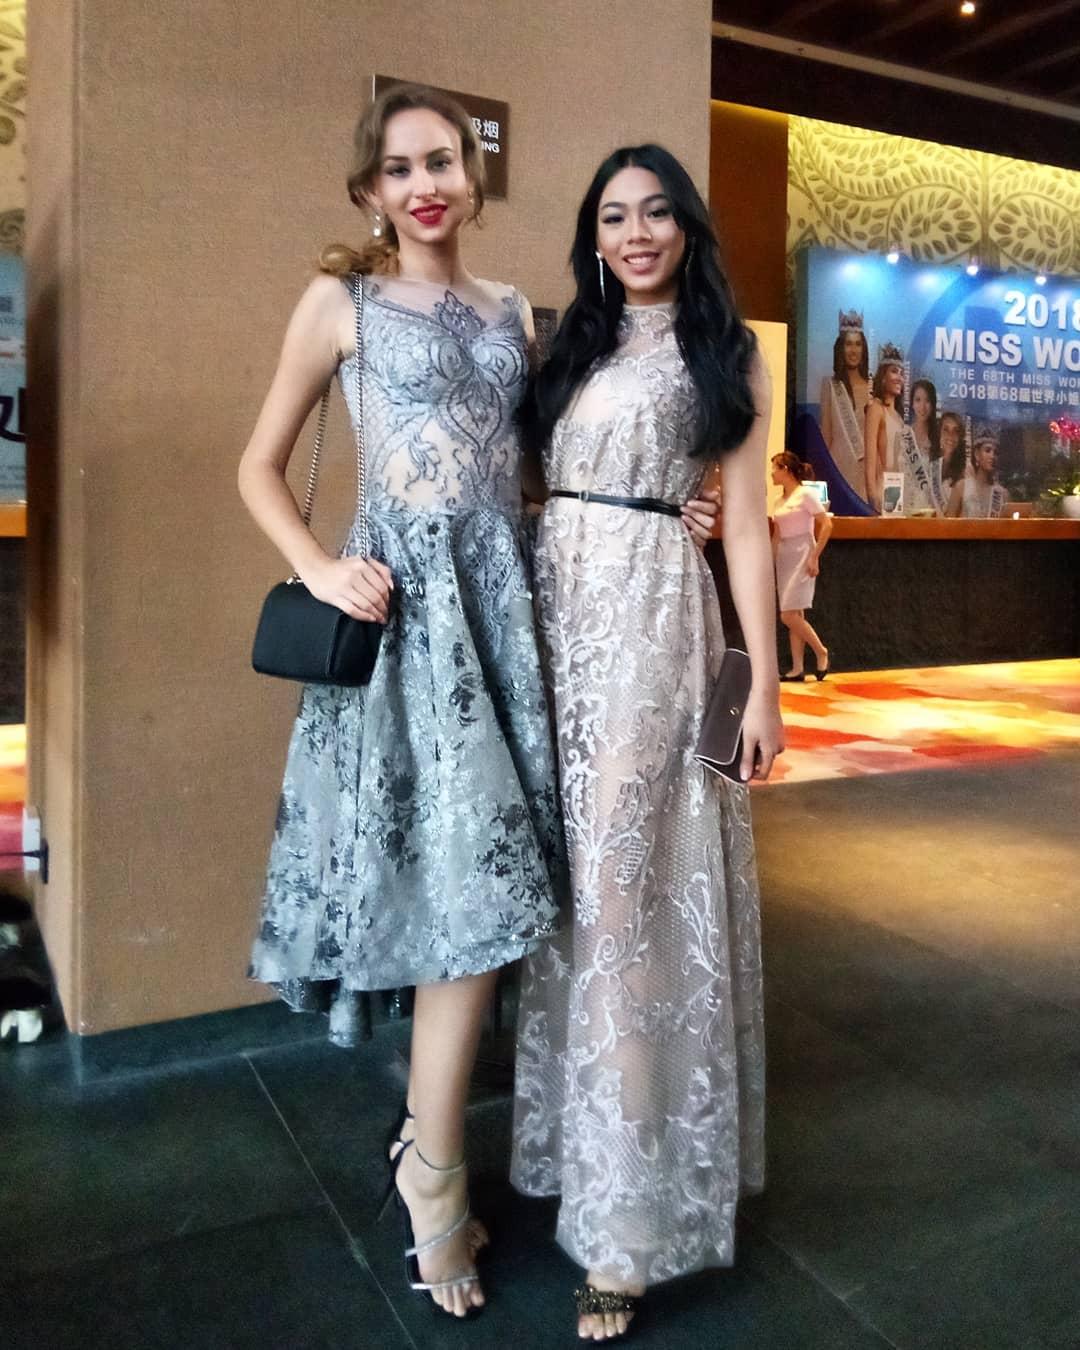 Cocktail Party, Alya Nurshabrina Pinjamkan Dress Ke Miss